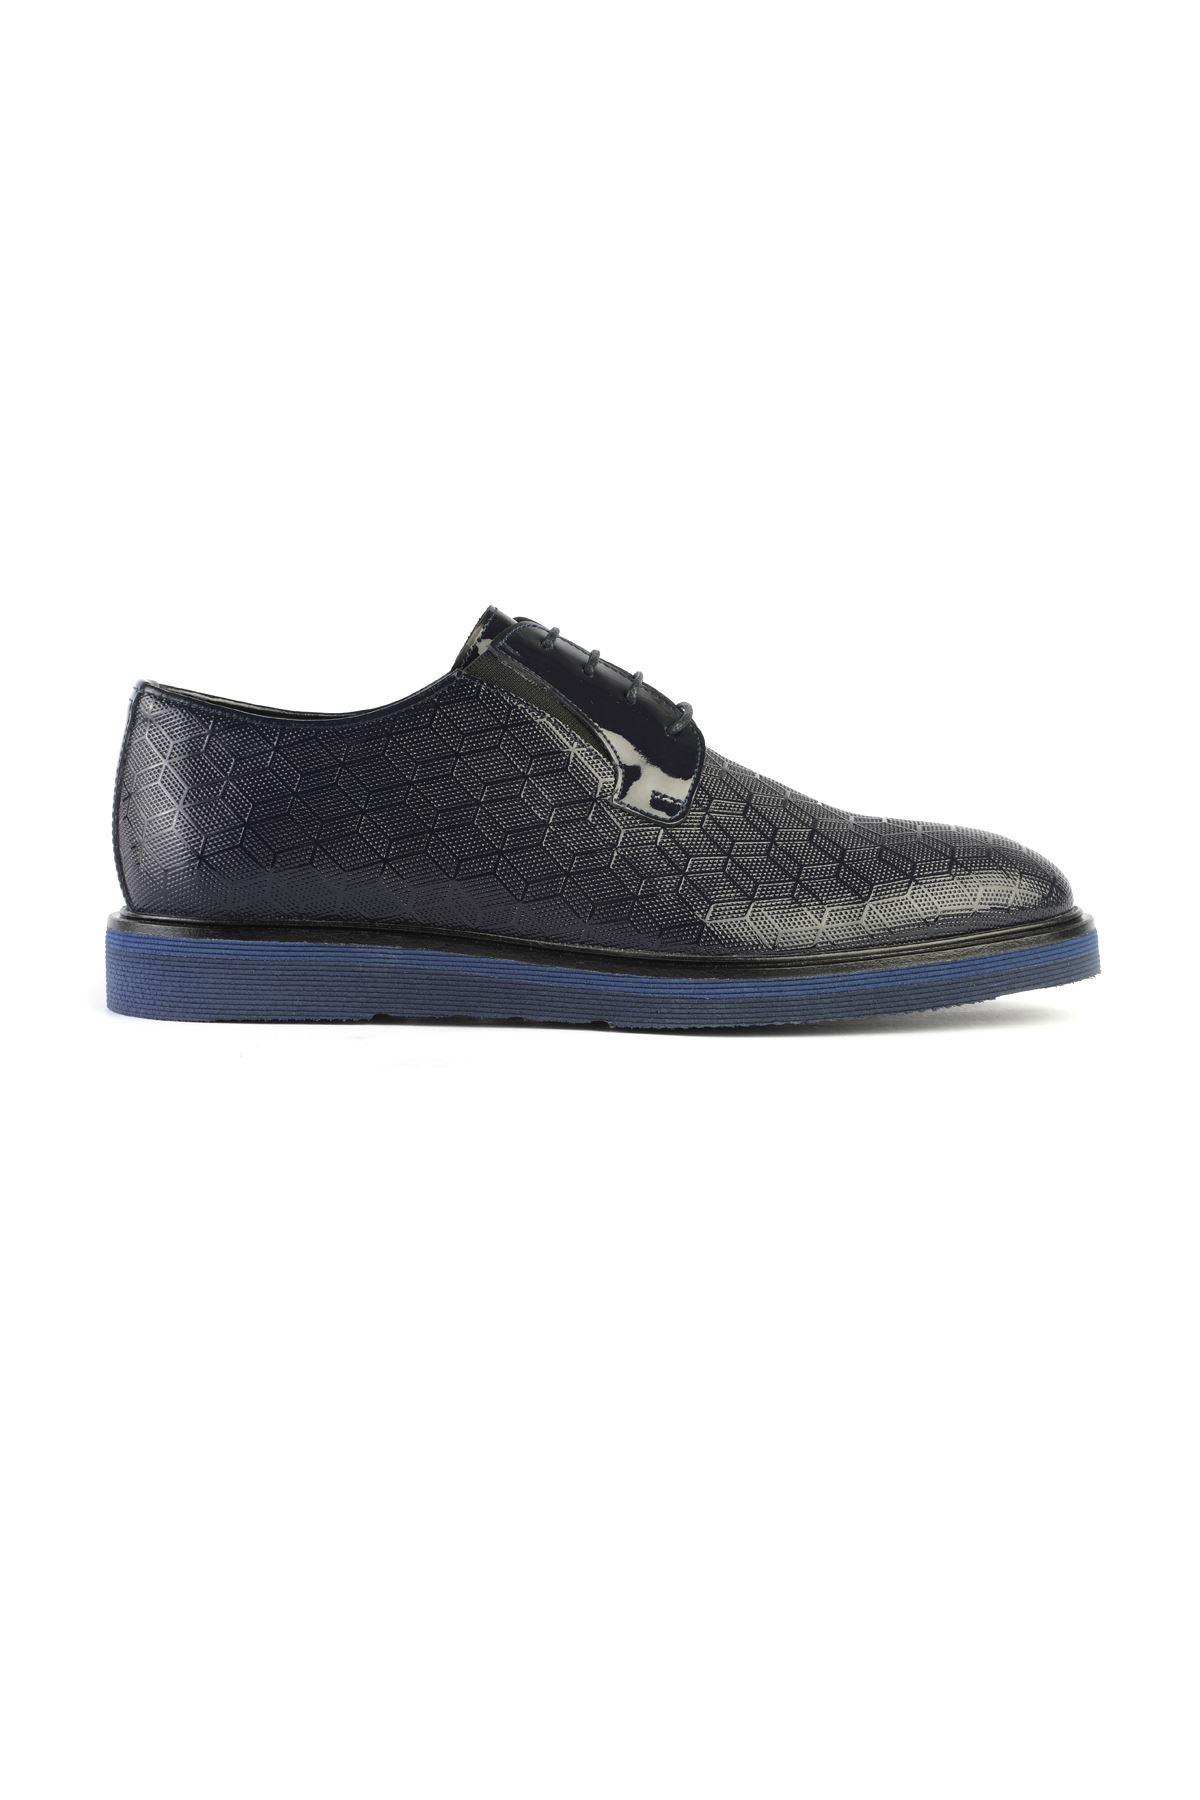 Libero 3234 Lacivert Oxford Ayakkabı